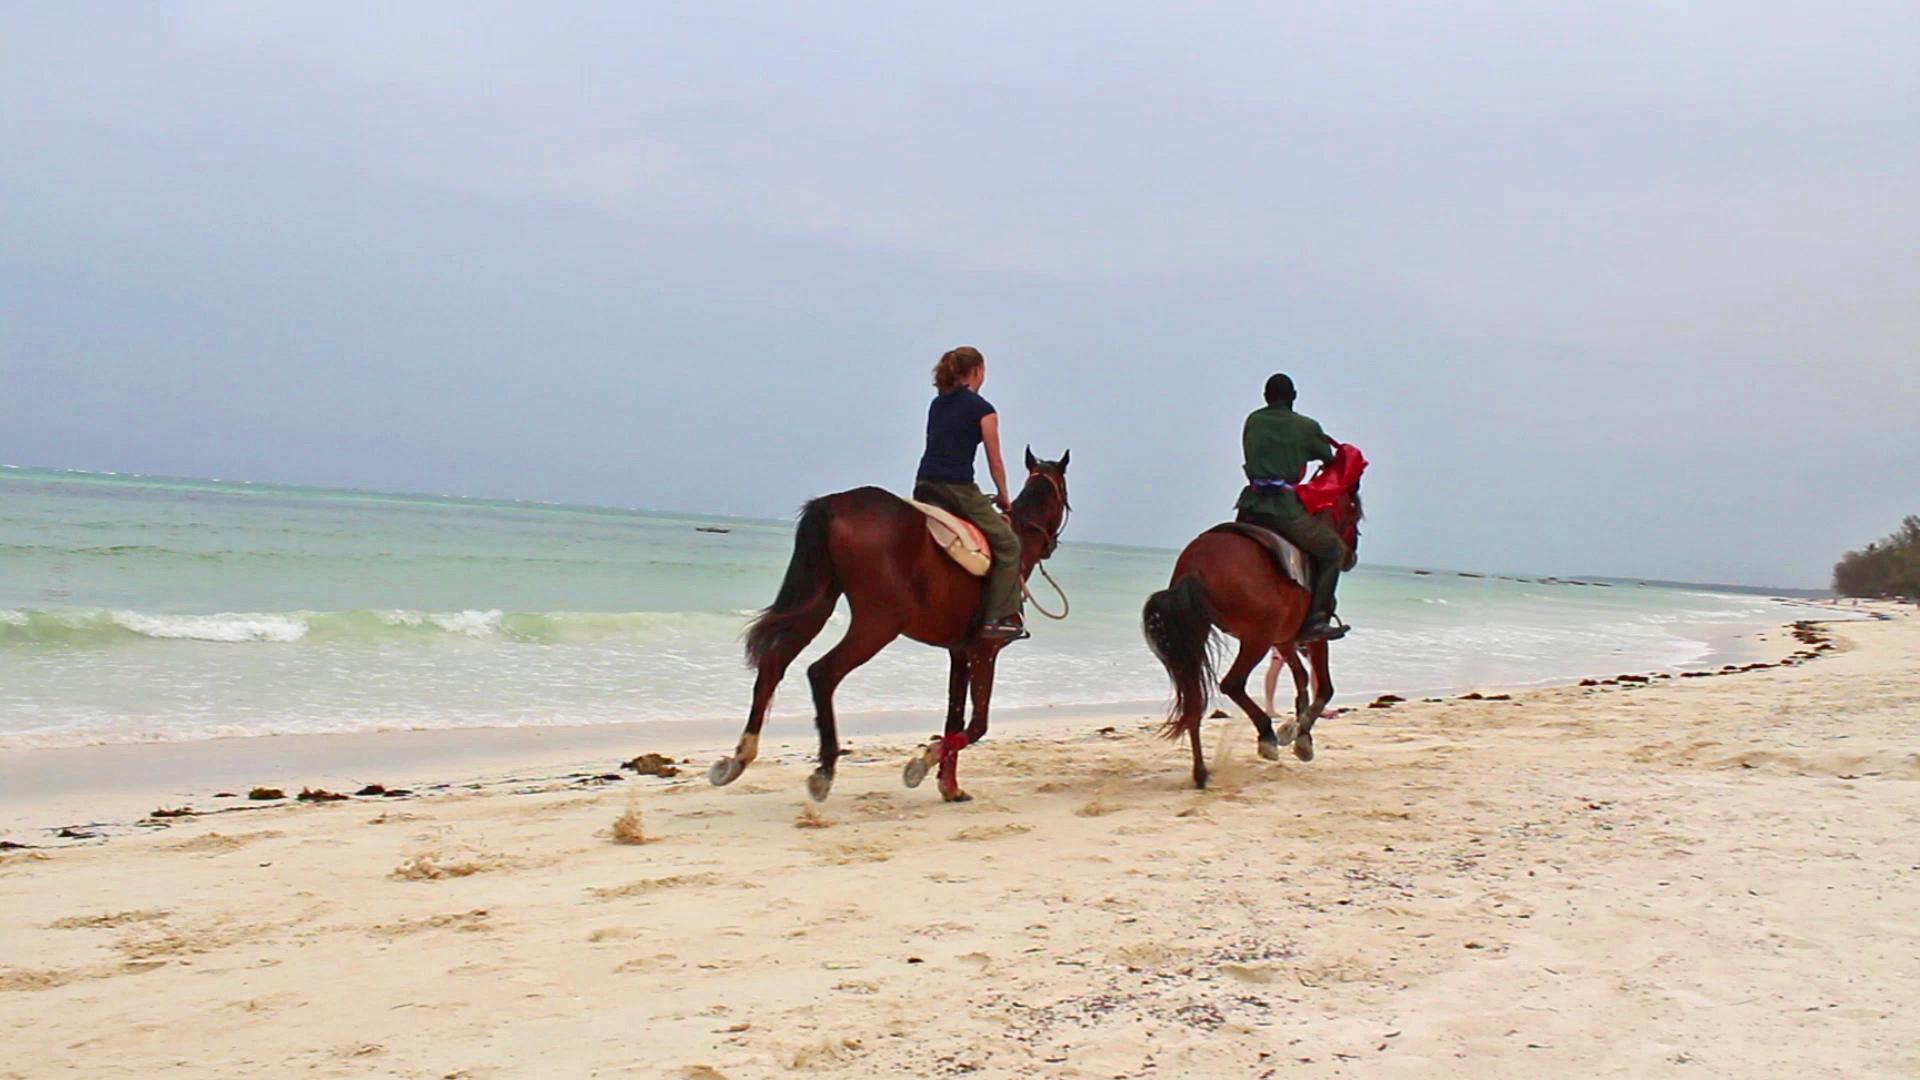 Horseback riding on the beach in Kiwengwa, Zanzibar